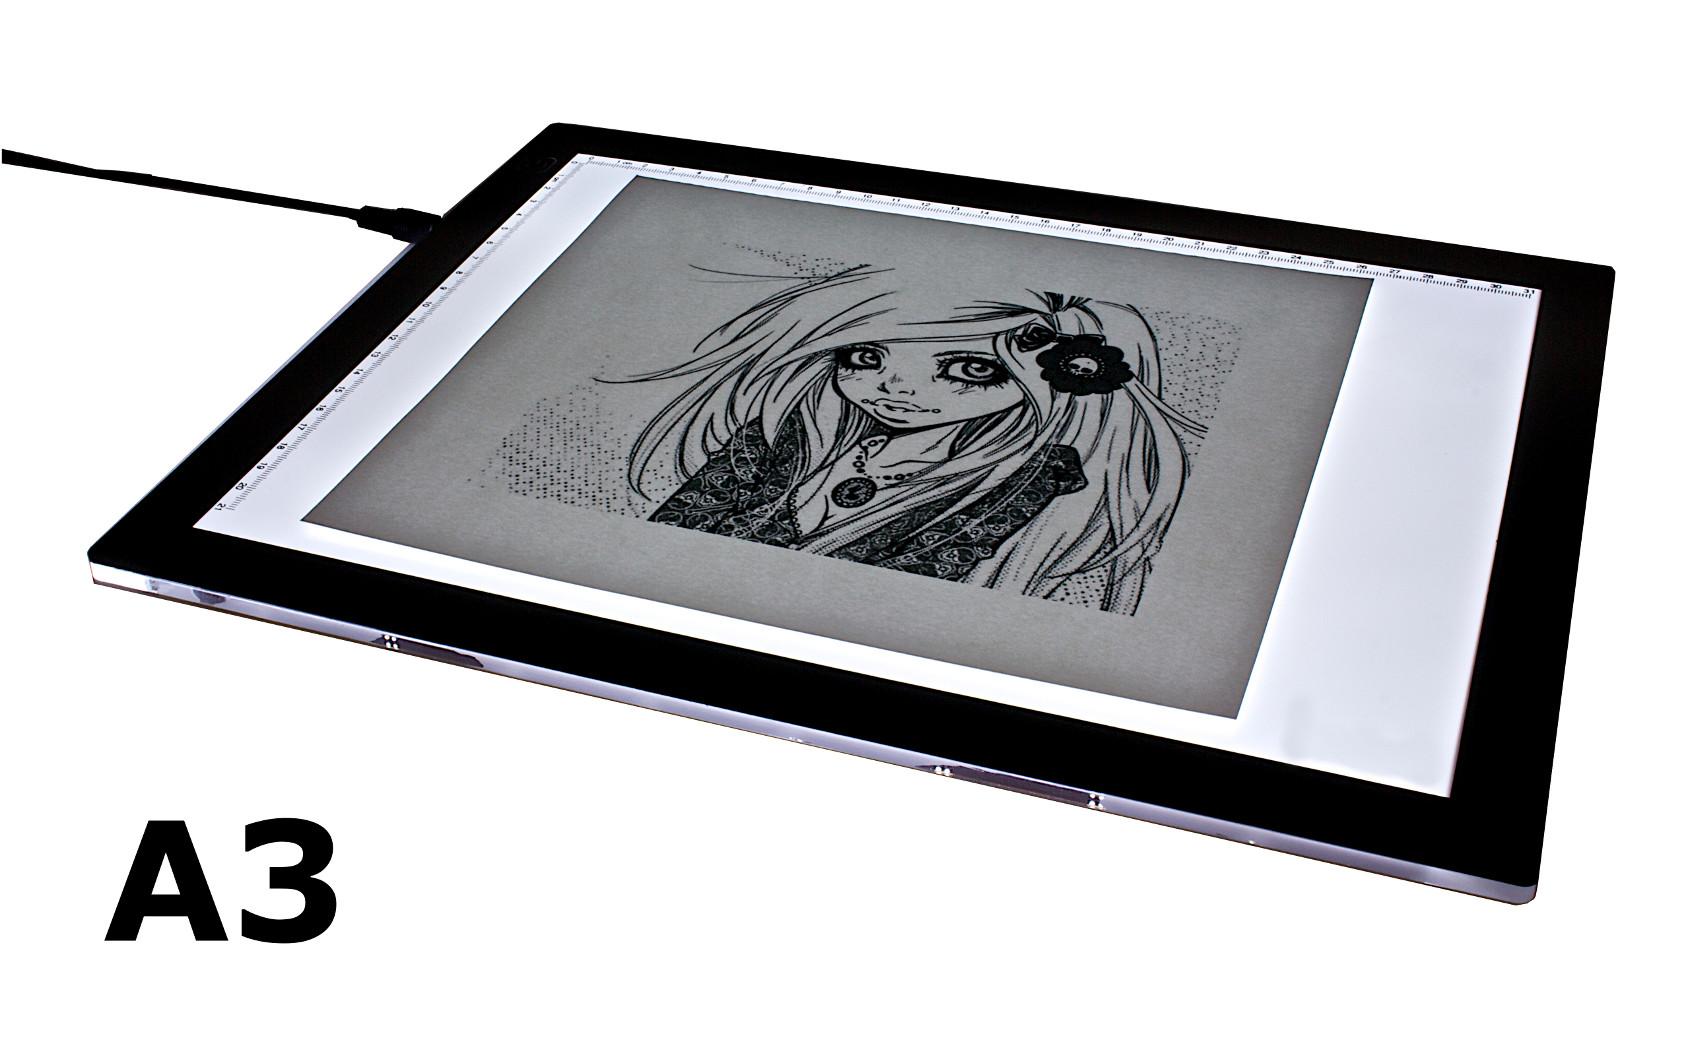 x steel porta product trace gagne light stainless box led c reg